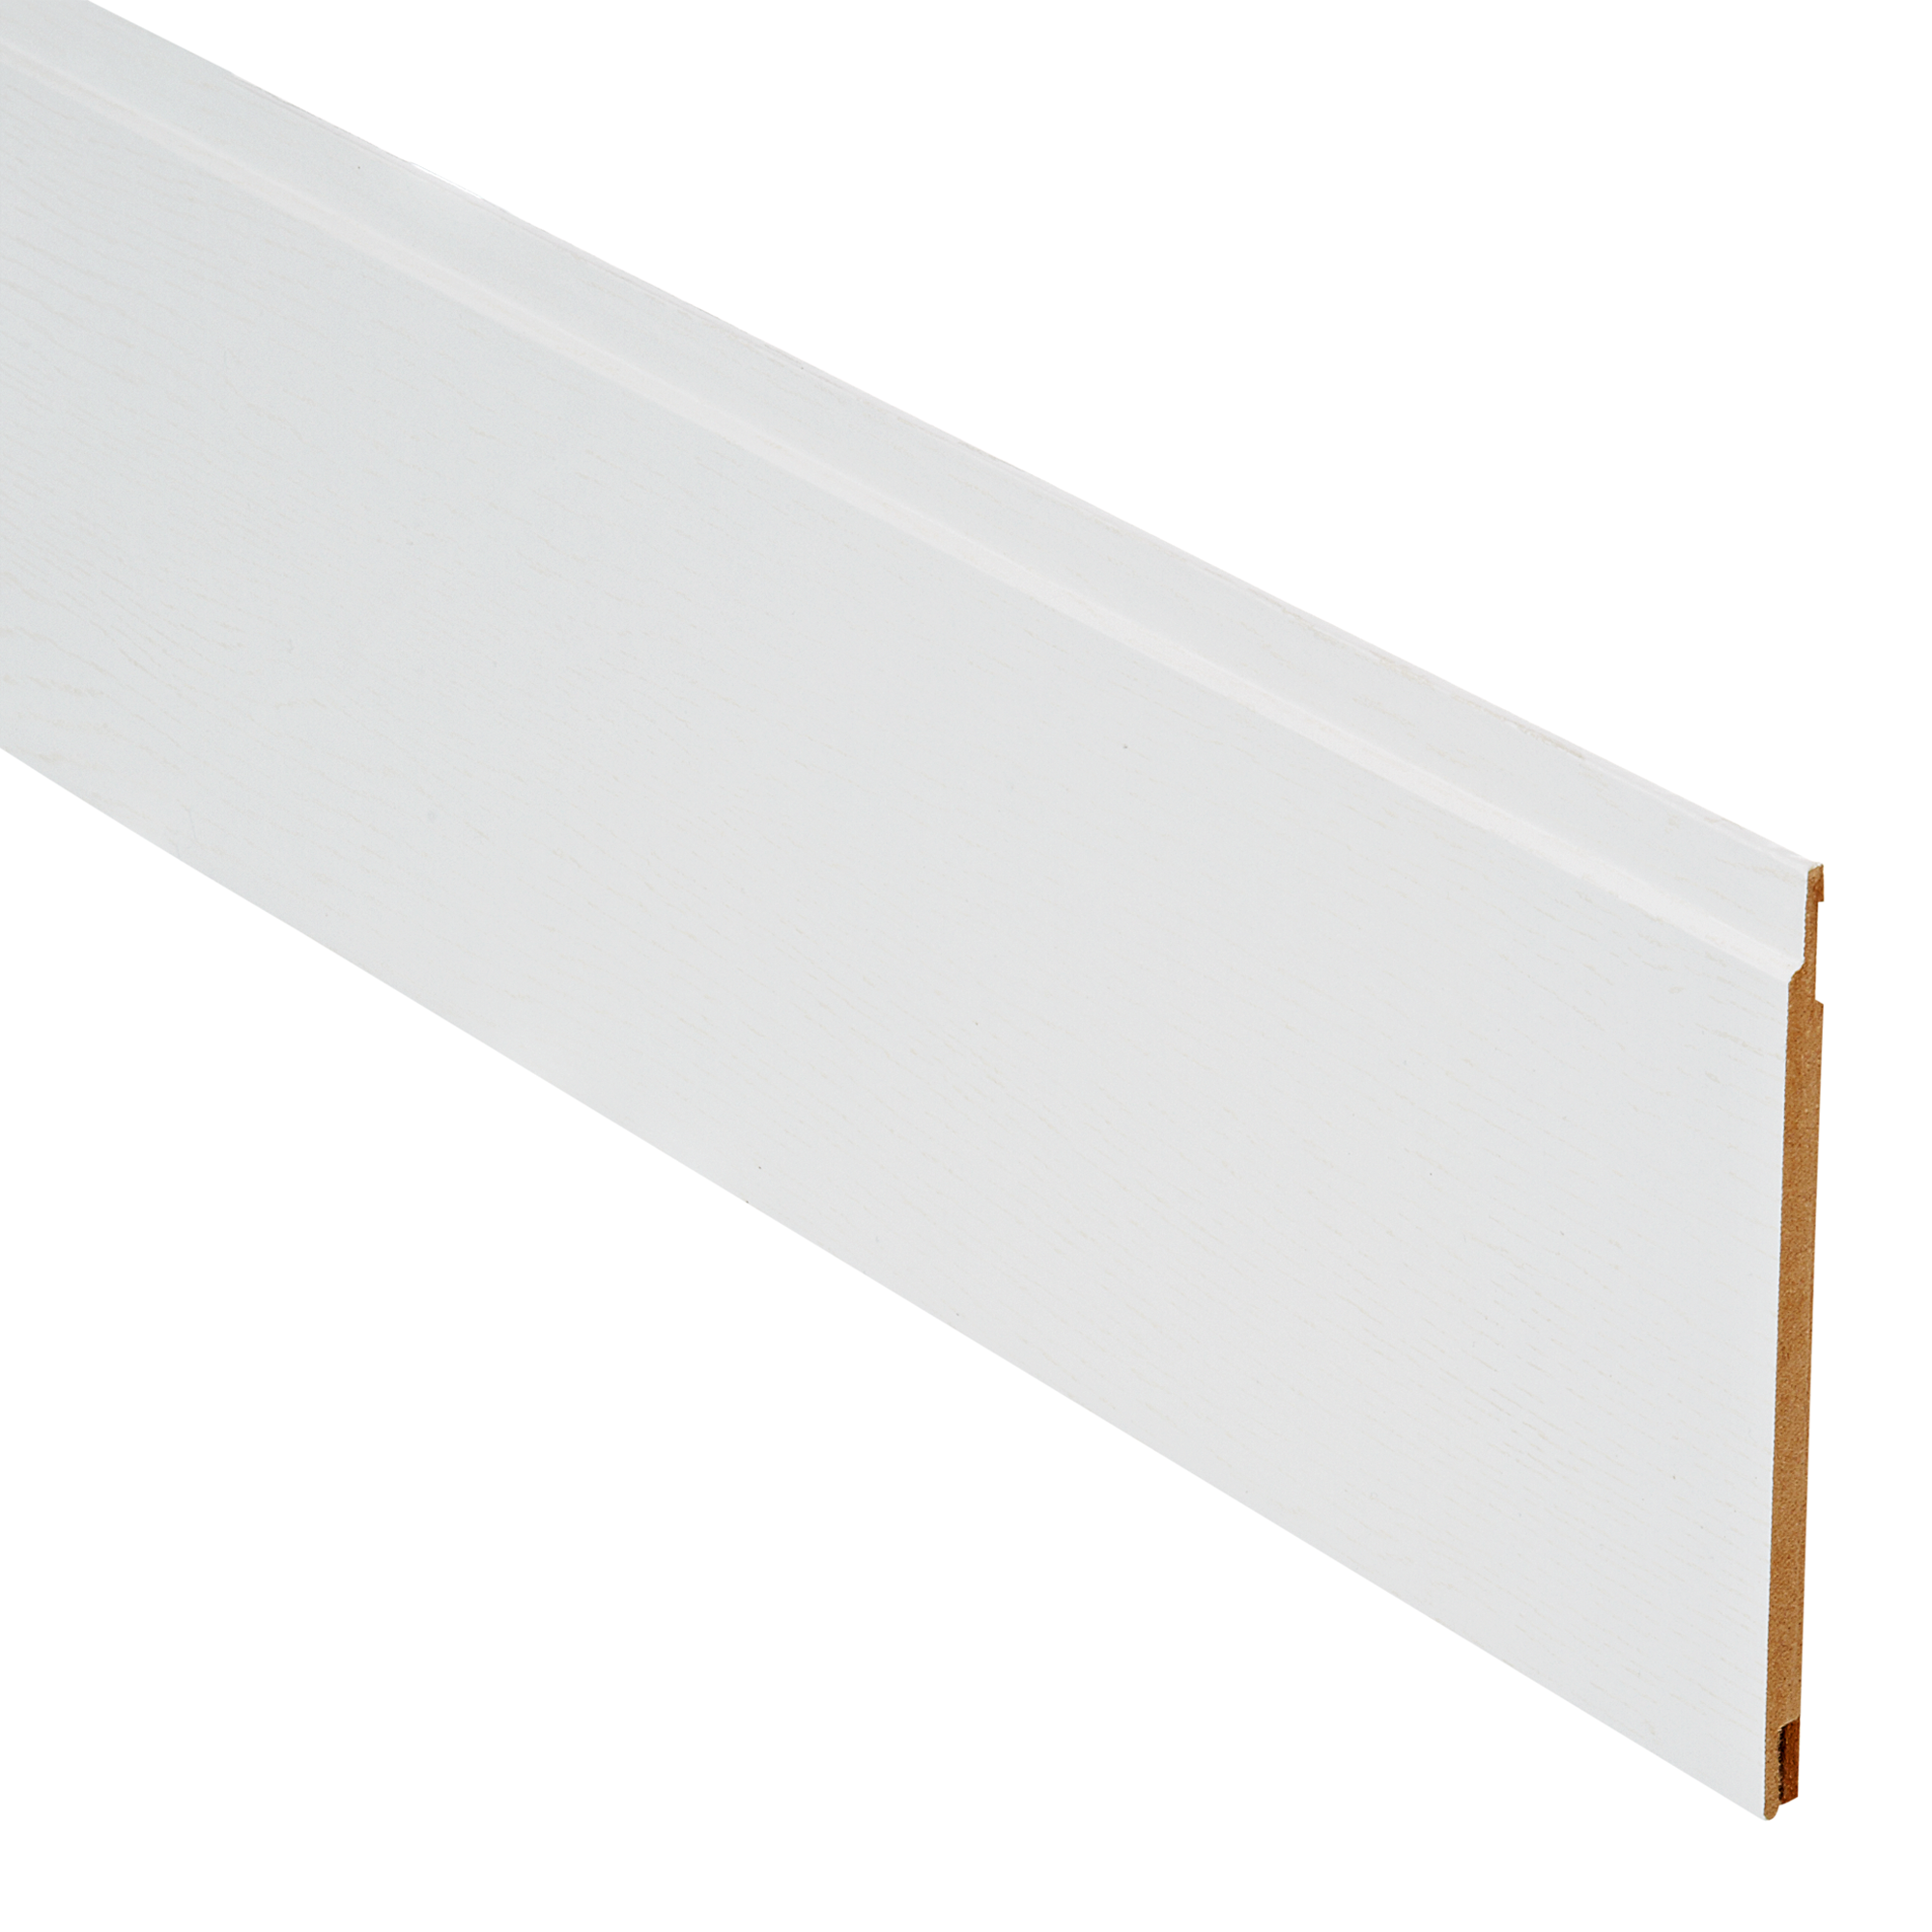 Steckpaneele 'Vario' edelweiß 20 x 20 cm